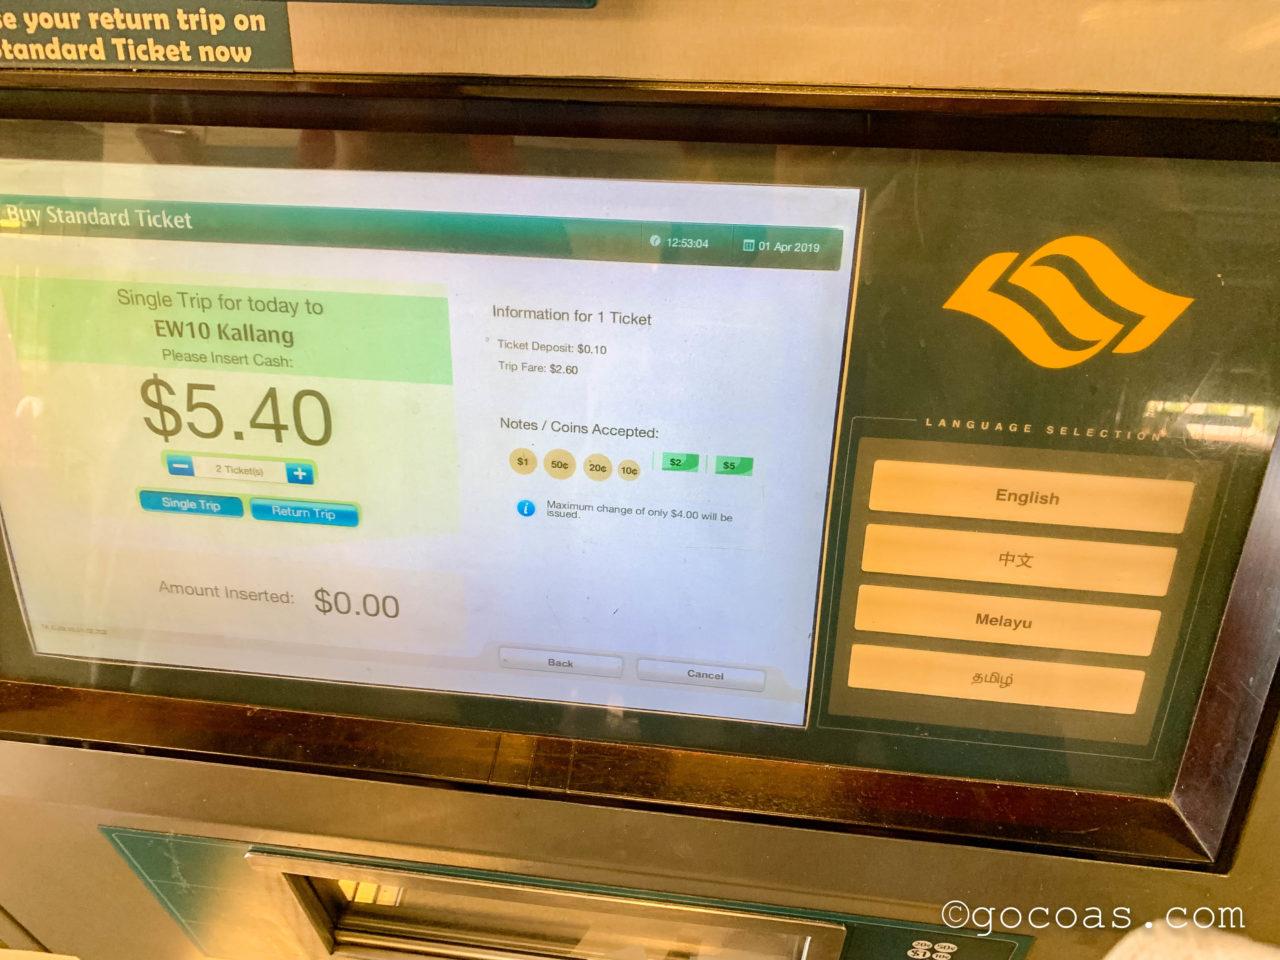 Marsiling MRTの券売機のチケット購入画面